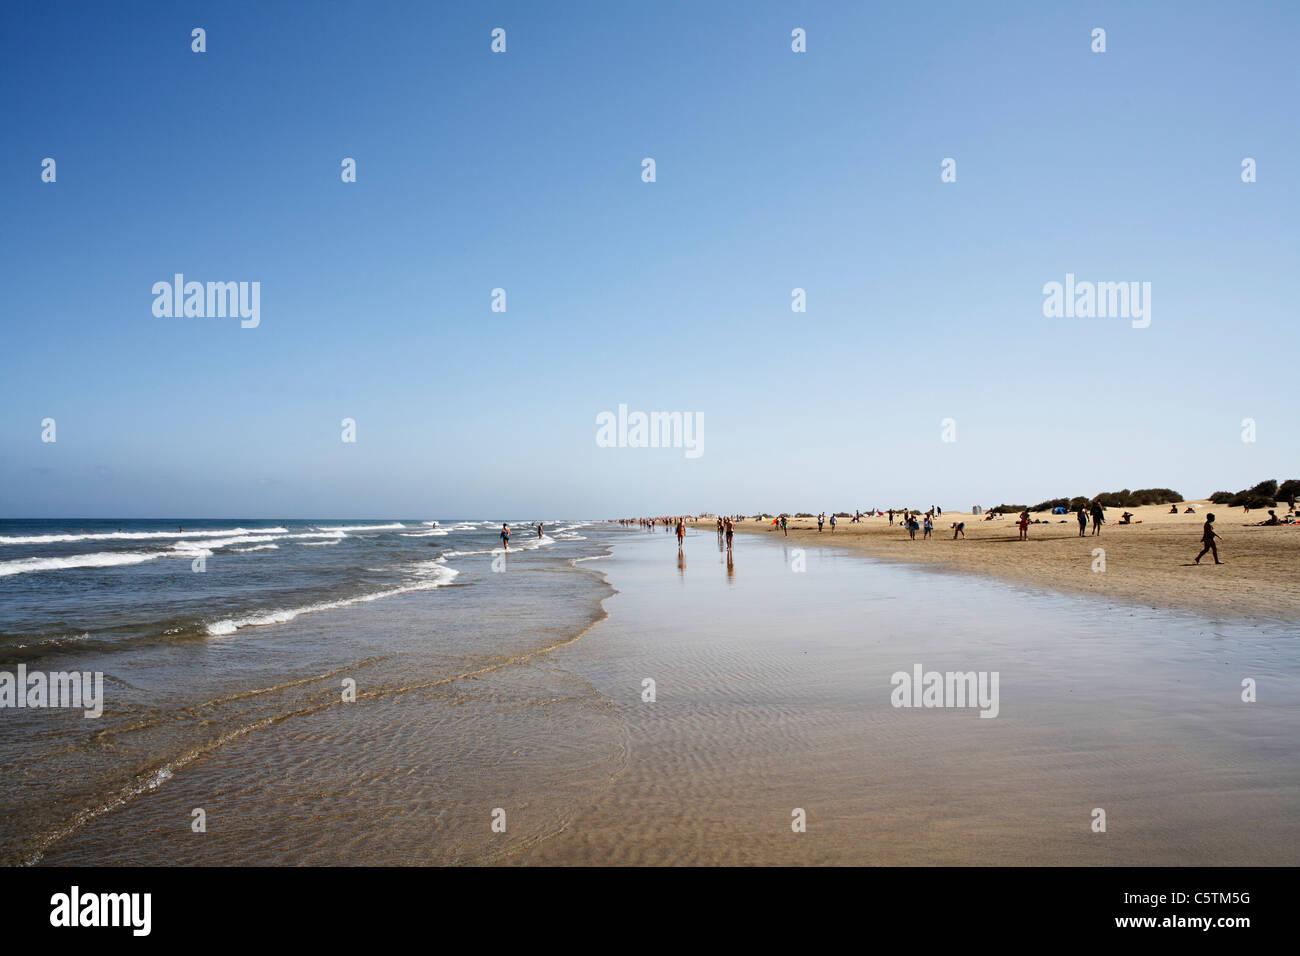 Spain, Gran Canaria, Costa Canaria, Playa del Ingles, Tourist on beach - Stock Image